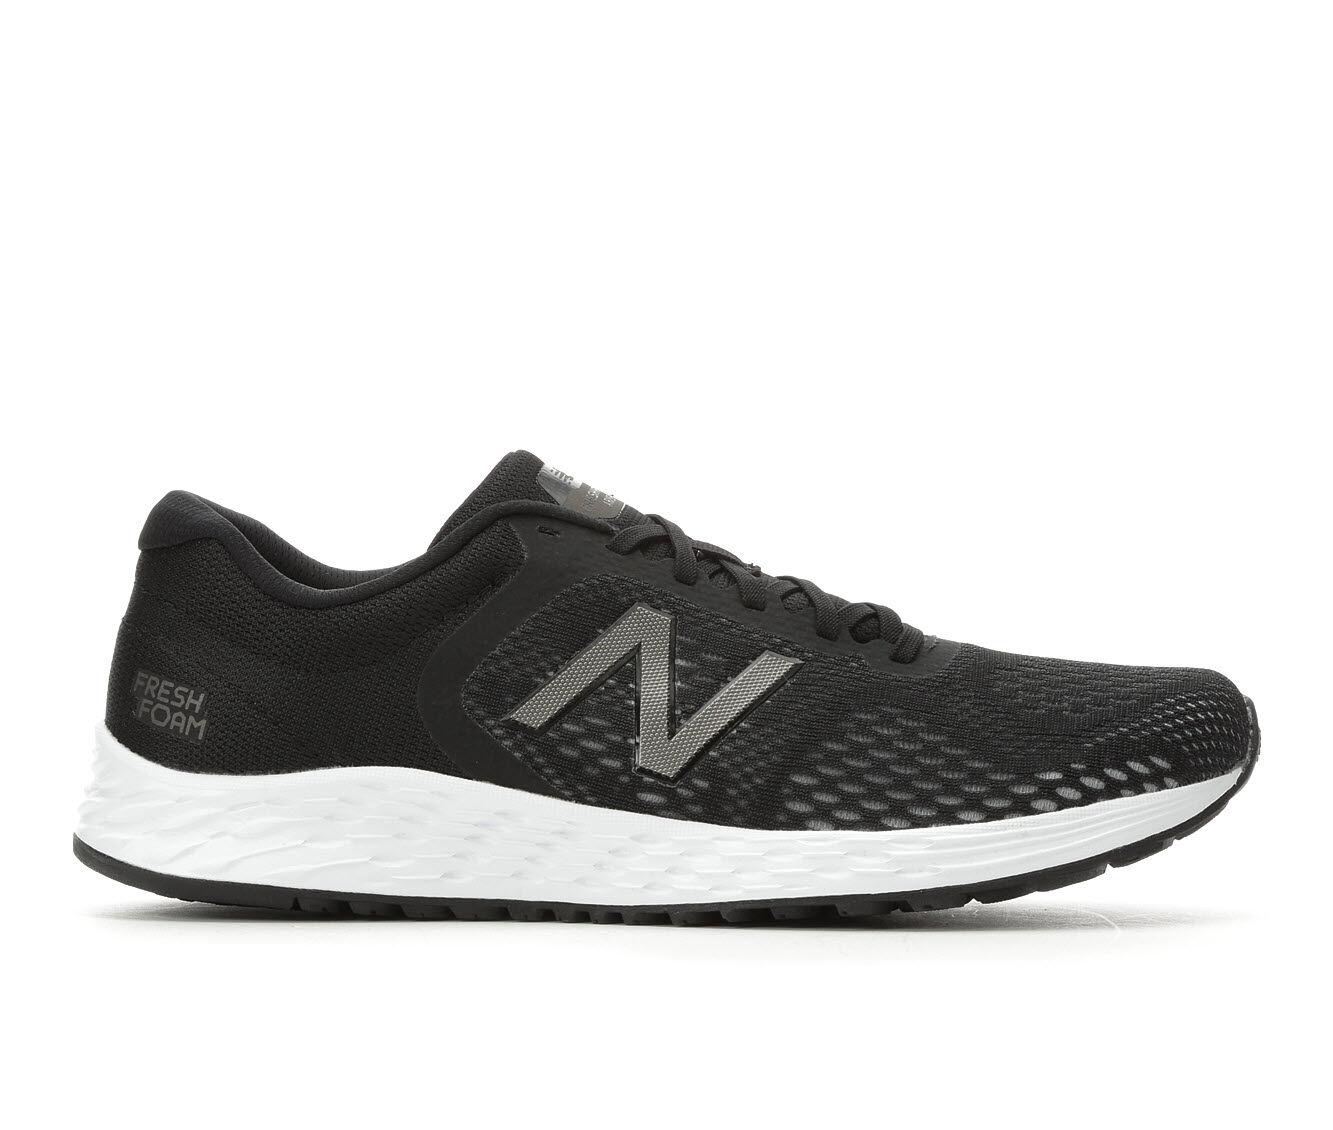 Appealing Men's New Balance Arishi v2 Running Shoes Blk/Wht/Sil